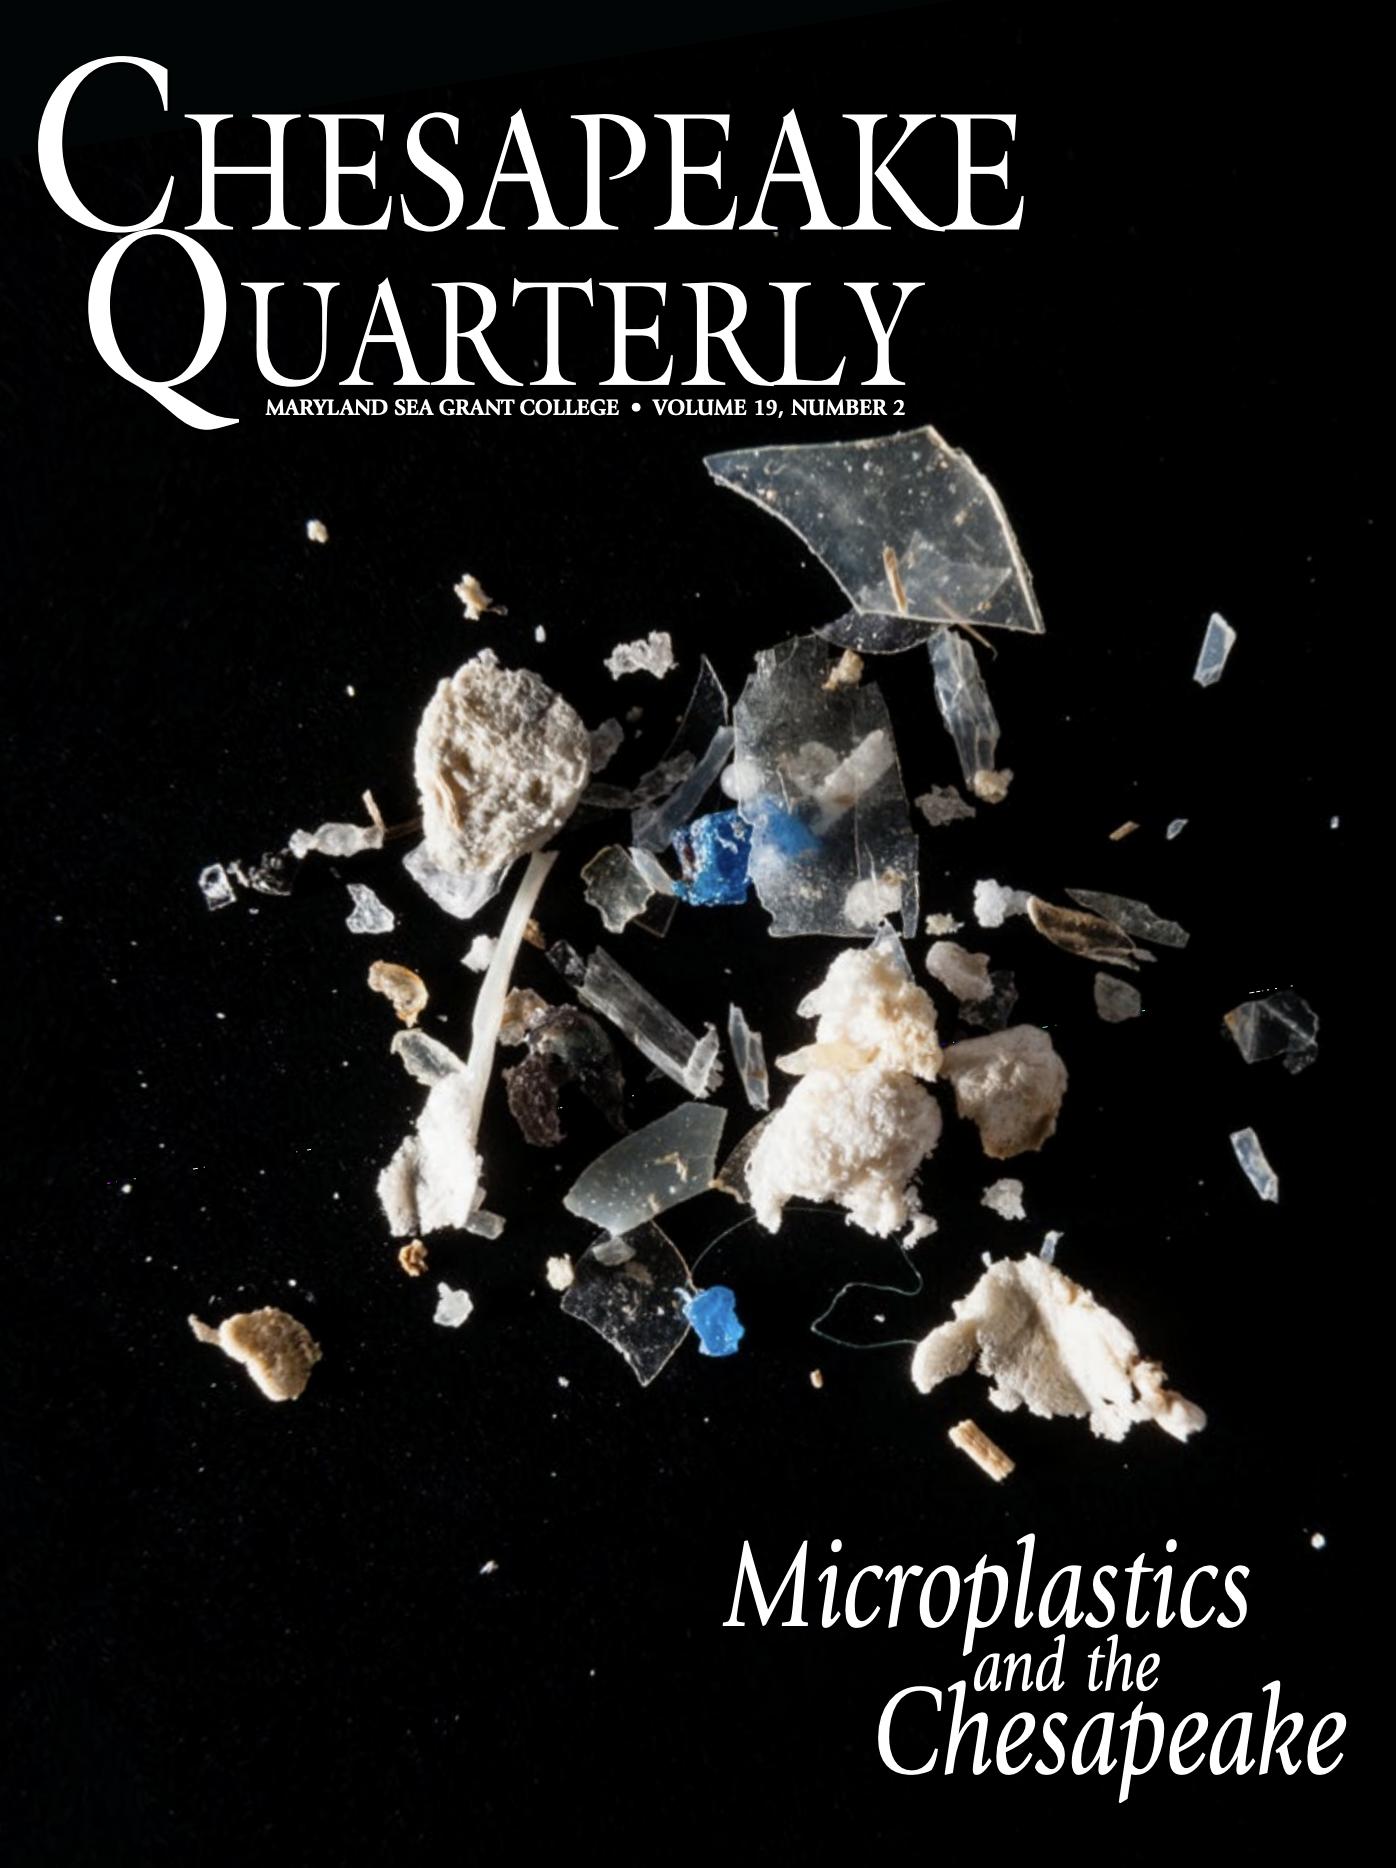 cover of Chesapeake Quarterly